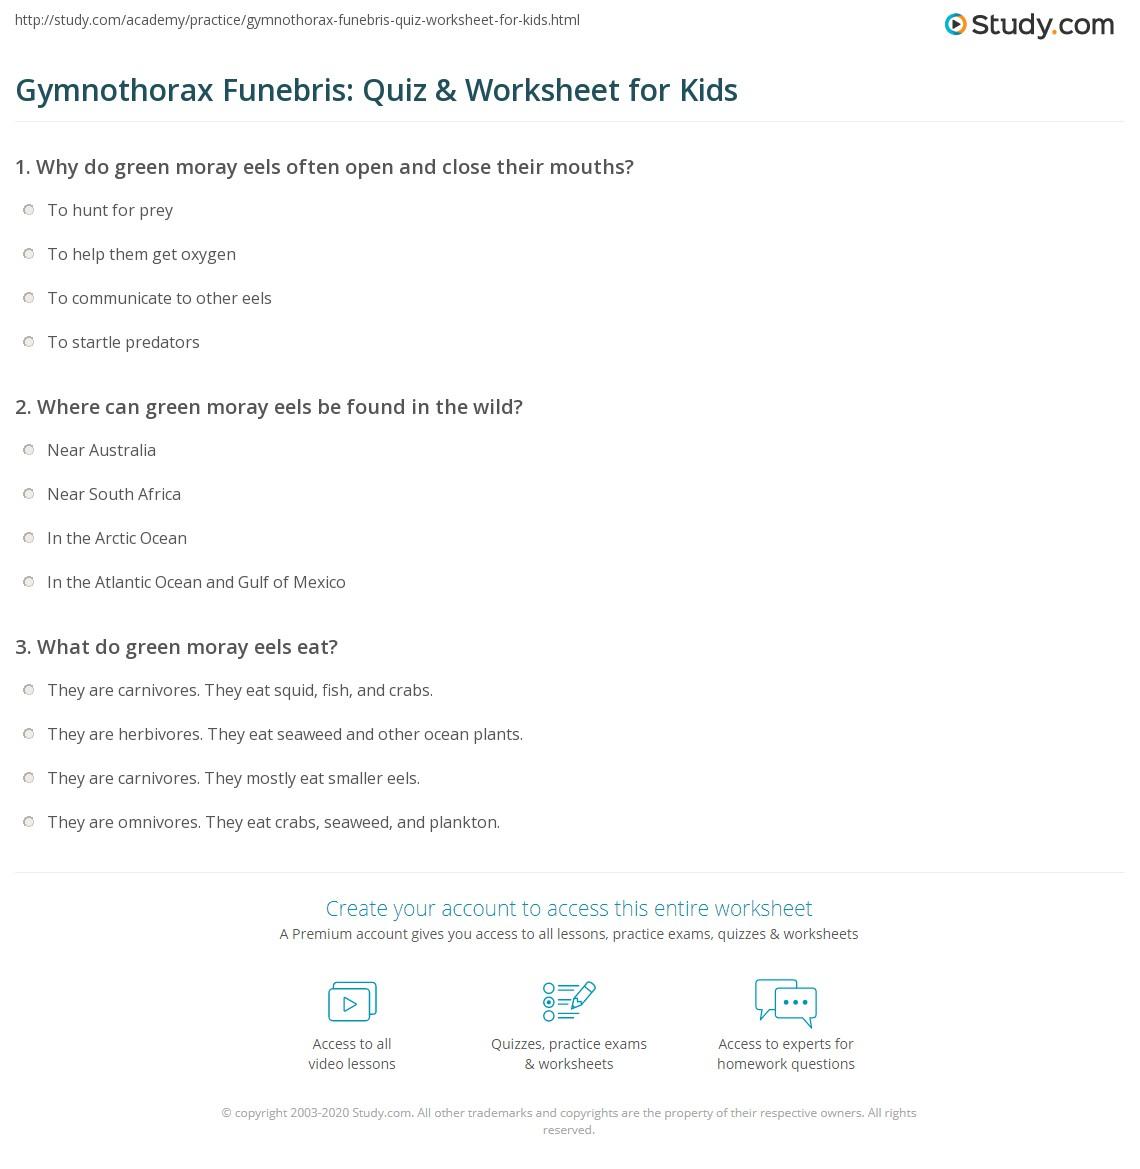 Gymnothorax Funebris Quiz Amp Worksheet For Kids